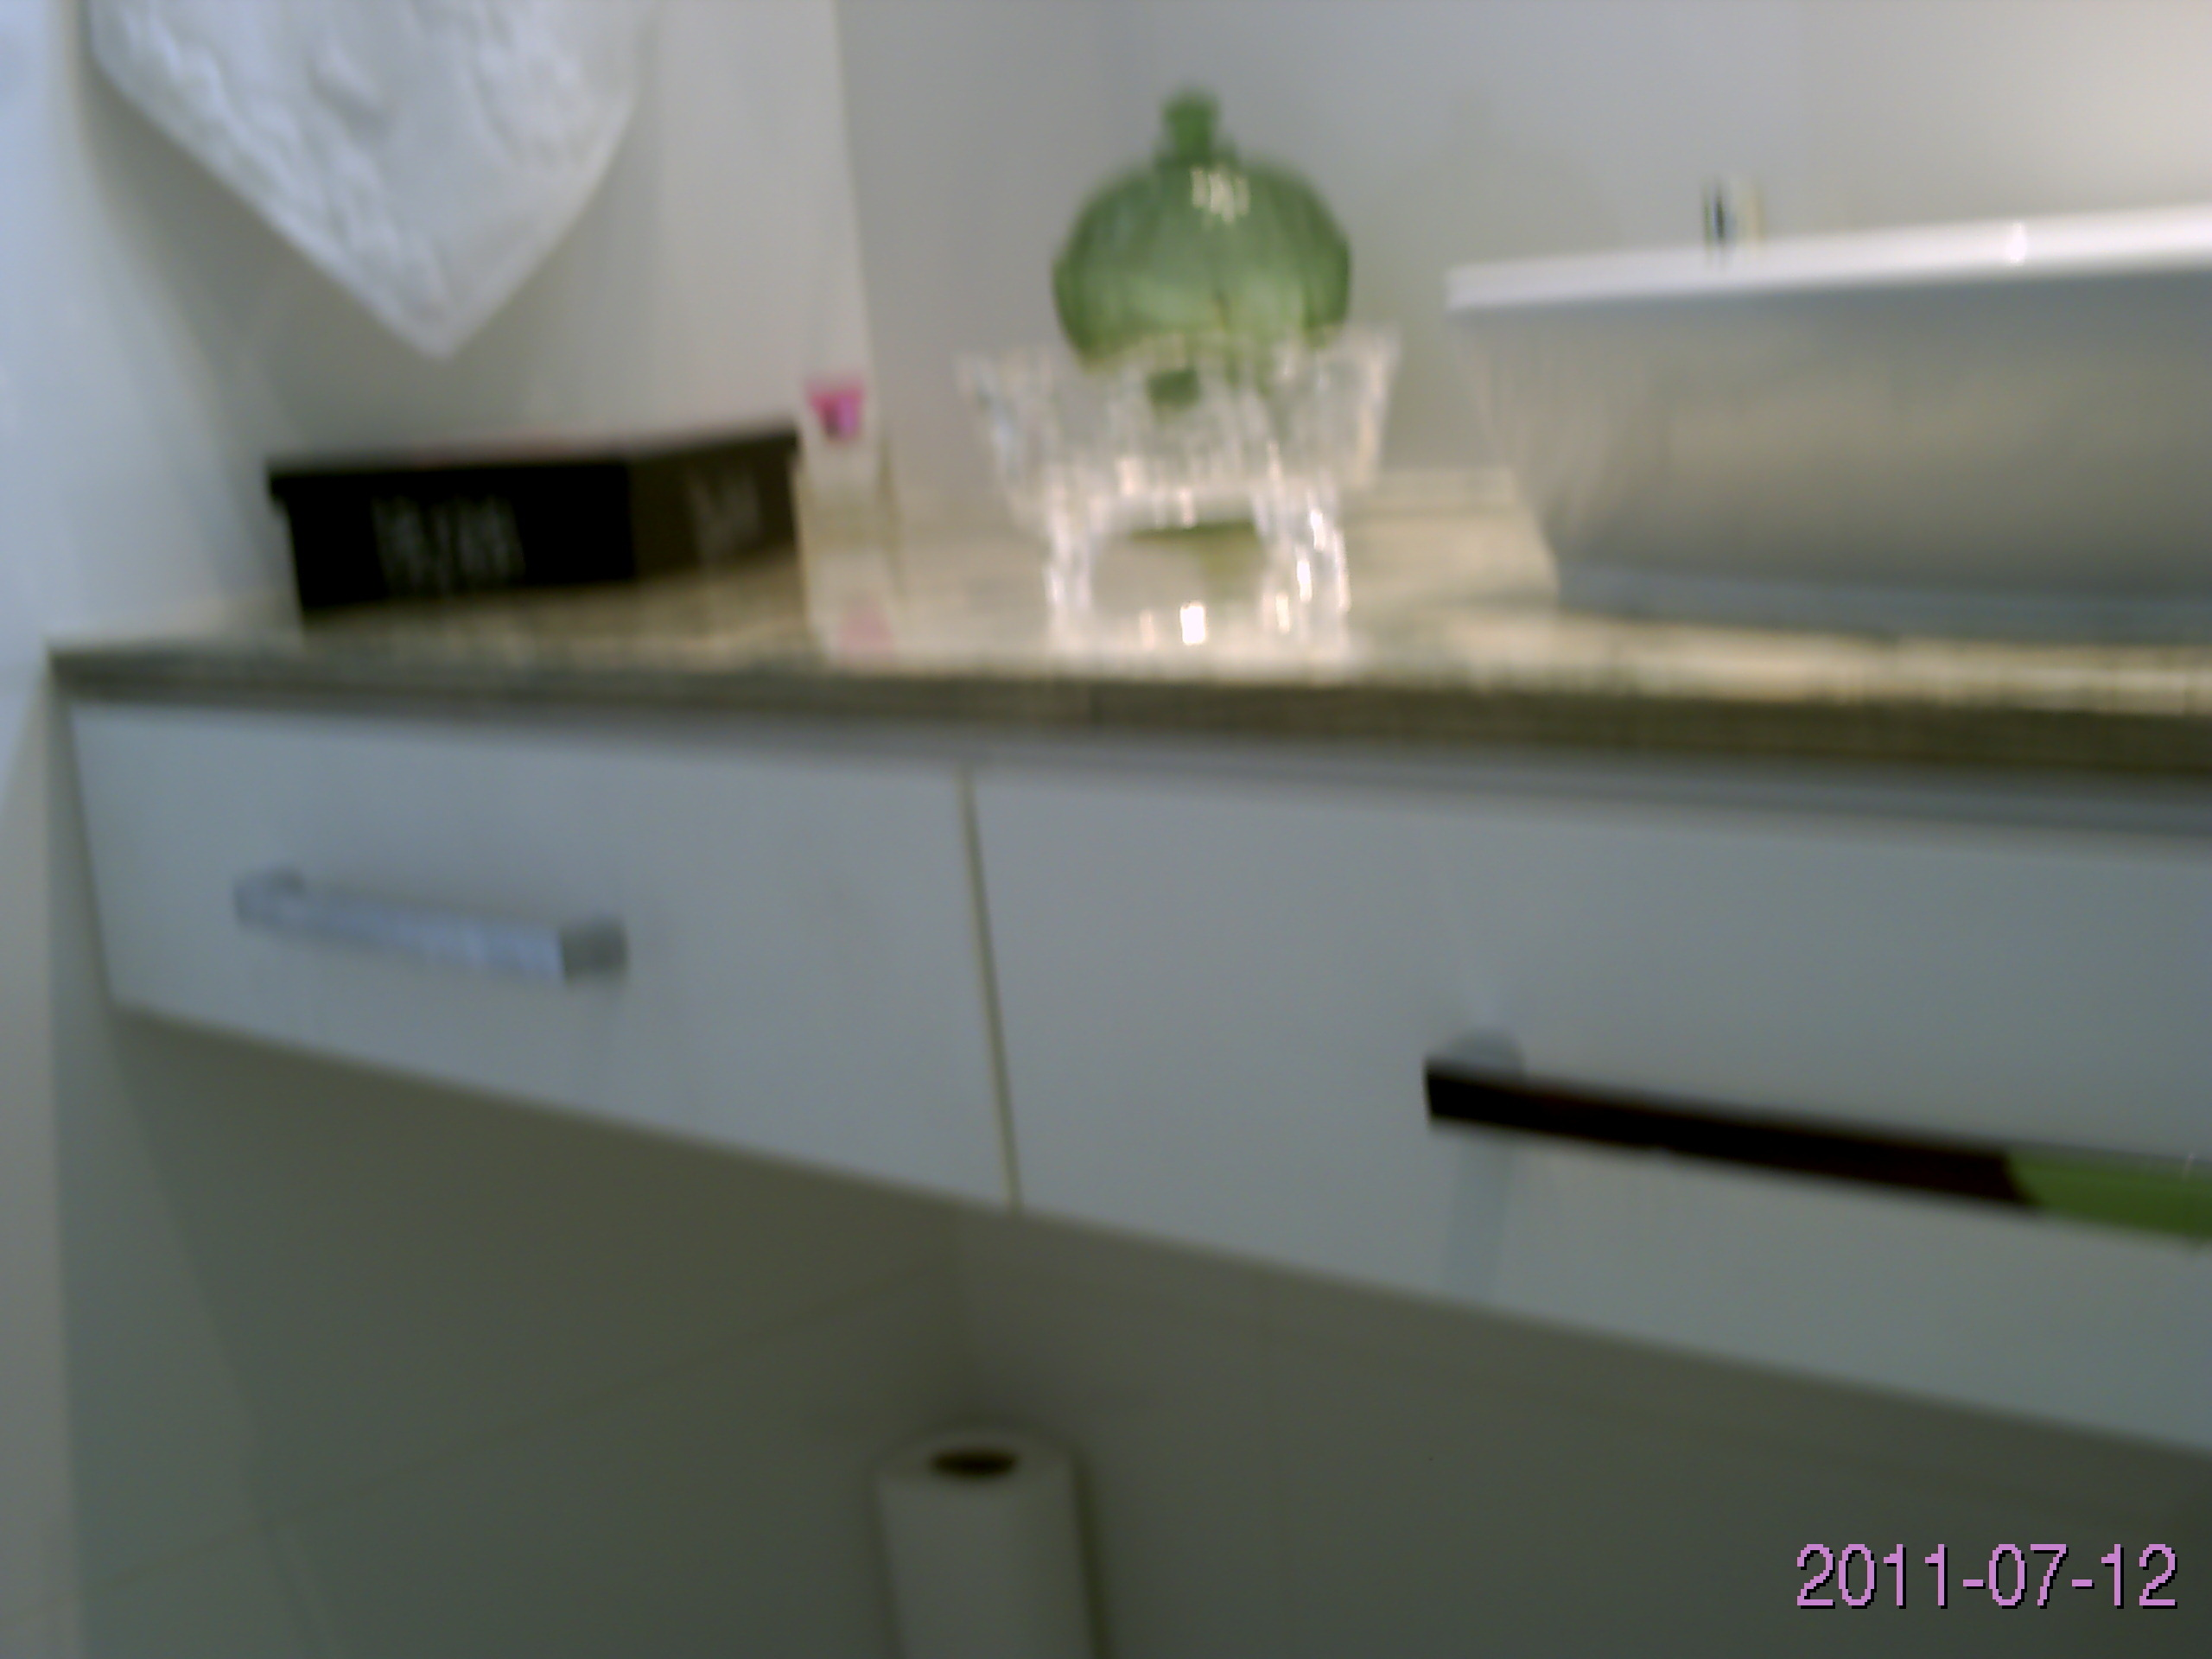 armario de banheiro armario de banheiro armario de banheiro #766A55 2560x1920 Armario Banheiro Sao Joao